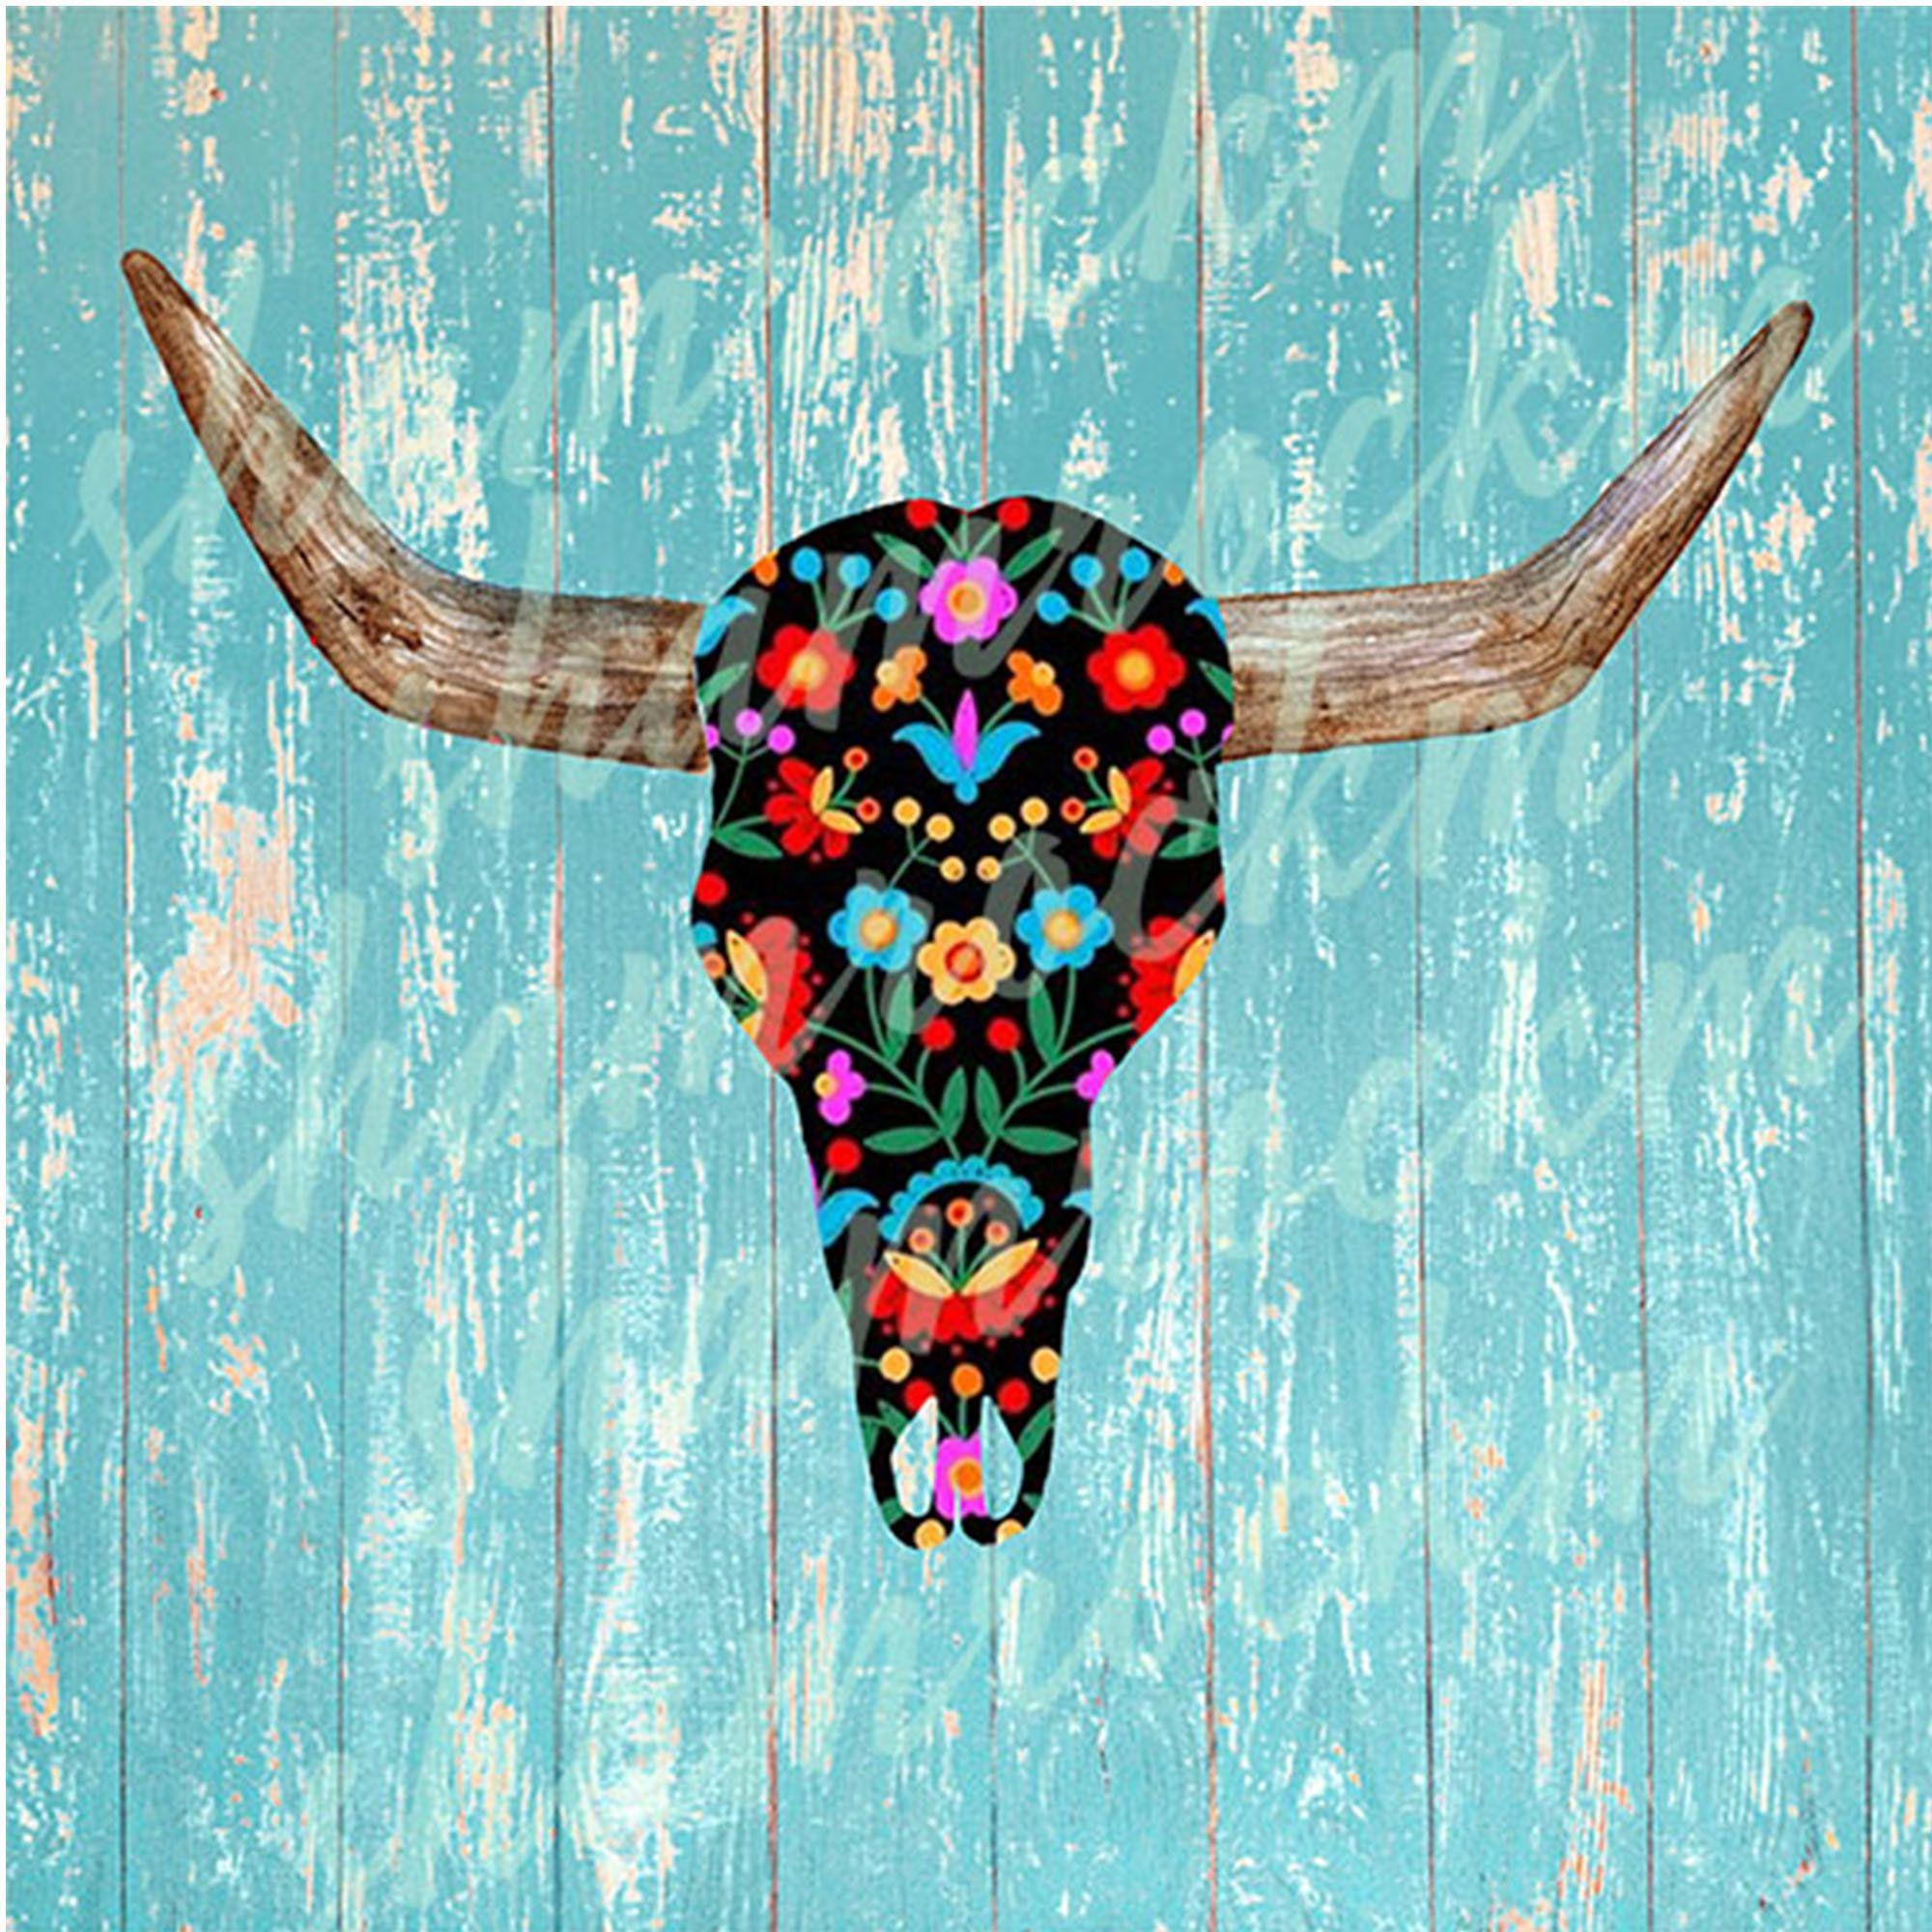 Cow Skull Watercolor Png 280350 Illustrations Design Bundles In 2021 Cow Skull Watercolor Graphic Illustration Design